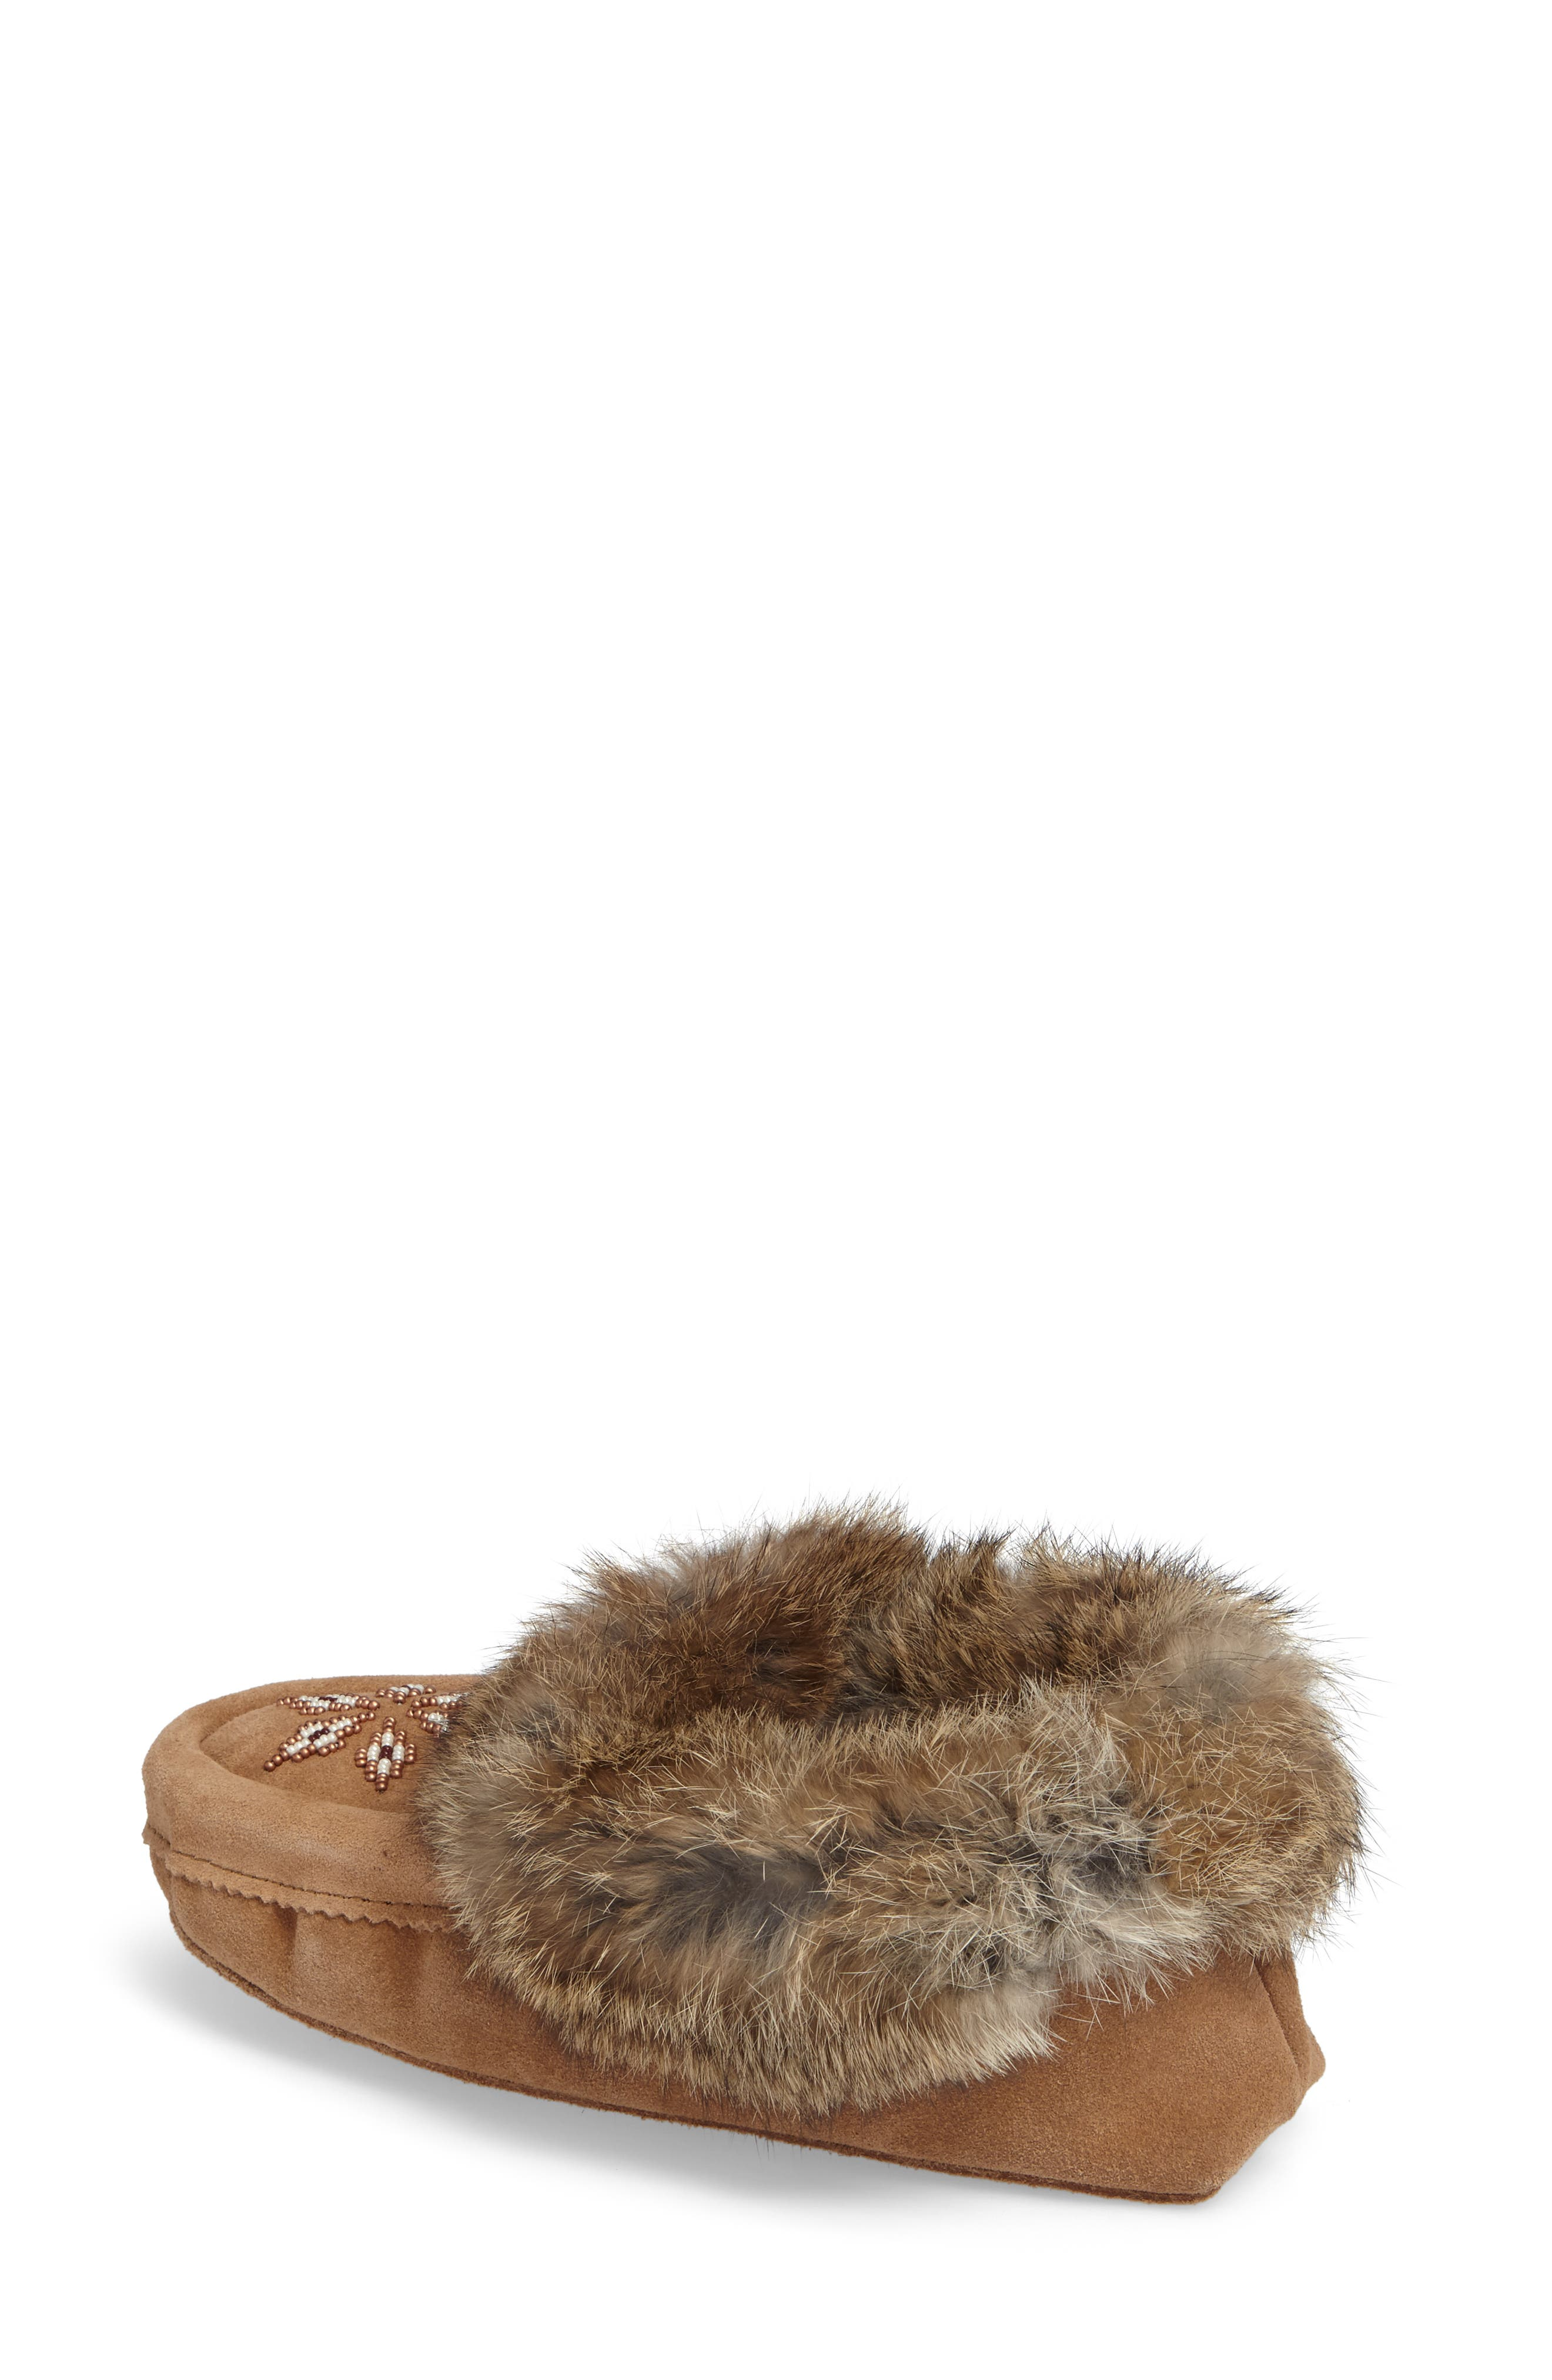 'Kanada' Genuine Rabbit Fur & Suede Moccasin Slipper,                             Alternate thumbnail 2, color,                             OAK FUR